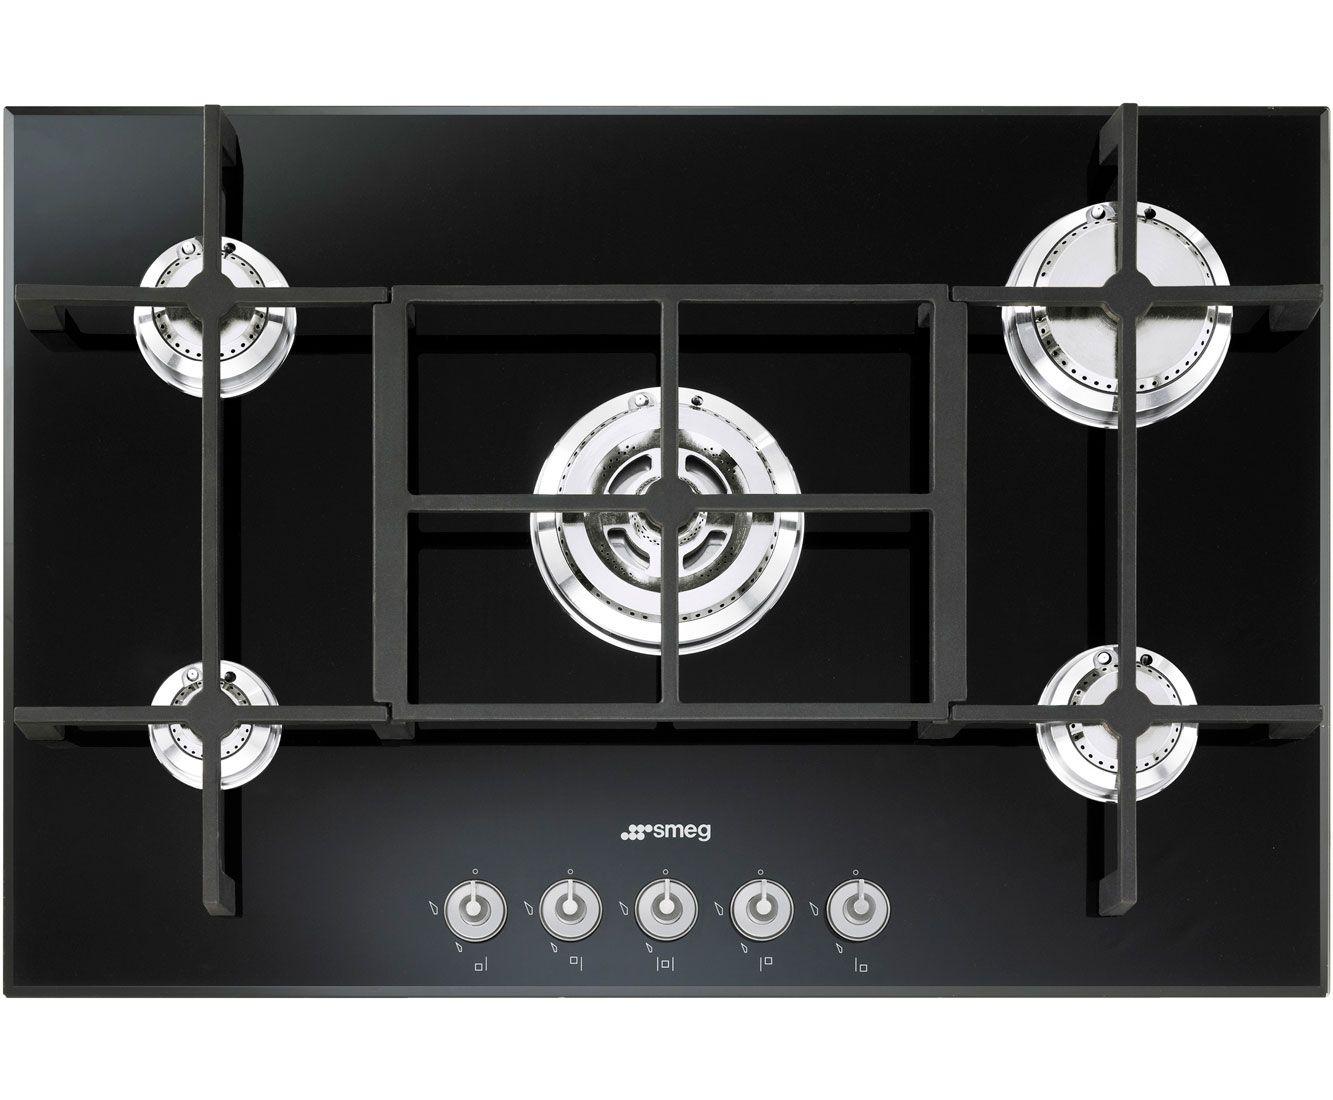 Smeg Pv750n Built In Gas Hob Black Glass Hobs Kitchen Appliances White Kitchen Appliances